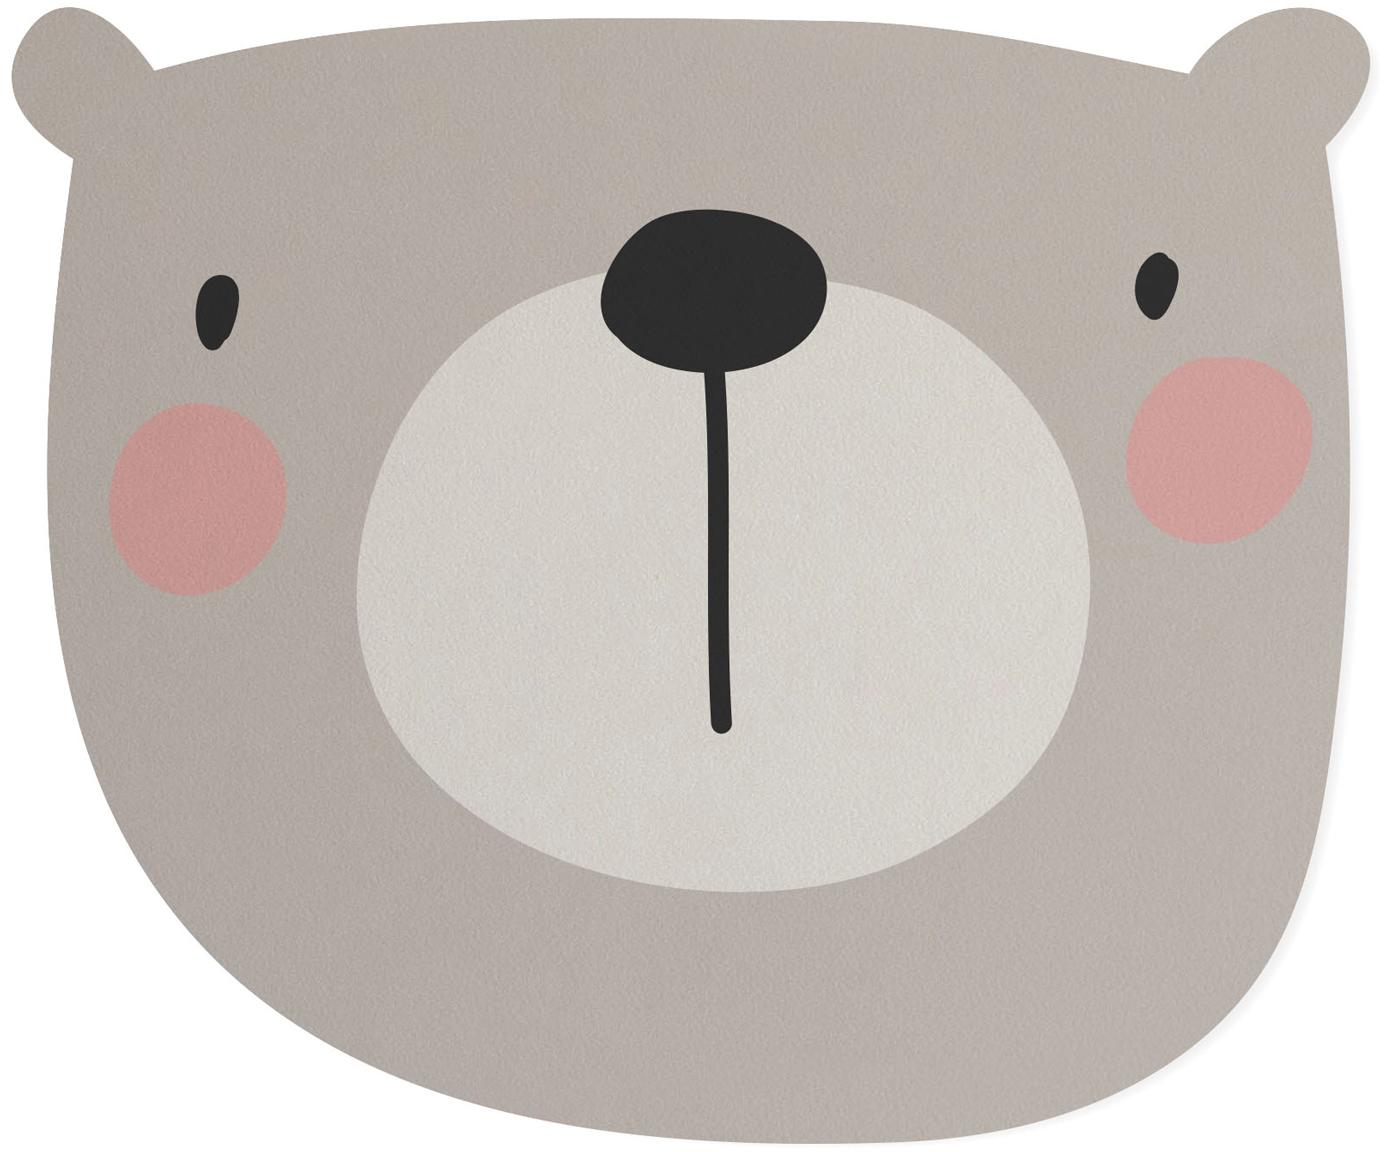 Bureau-onderlegger Bear, Jute- en harsvezels, Grijs, beige, roze, zwart, 35 x 55 cm